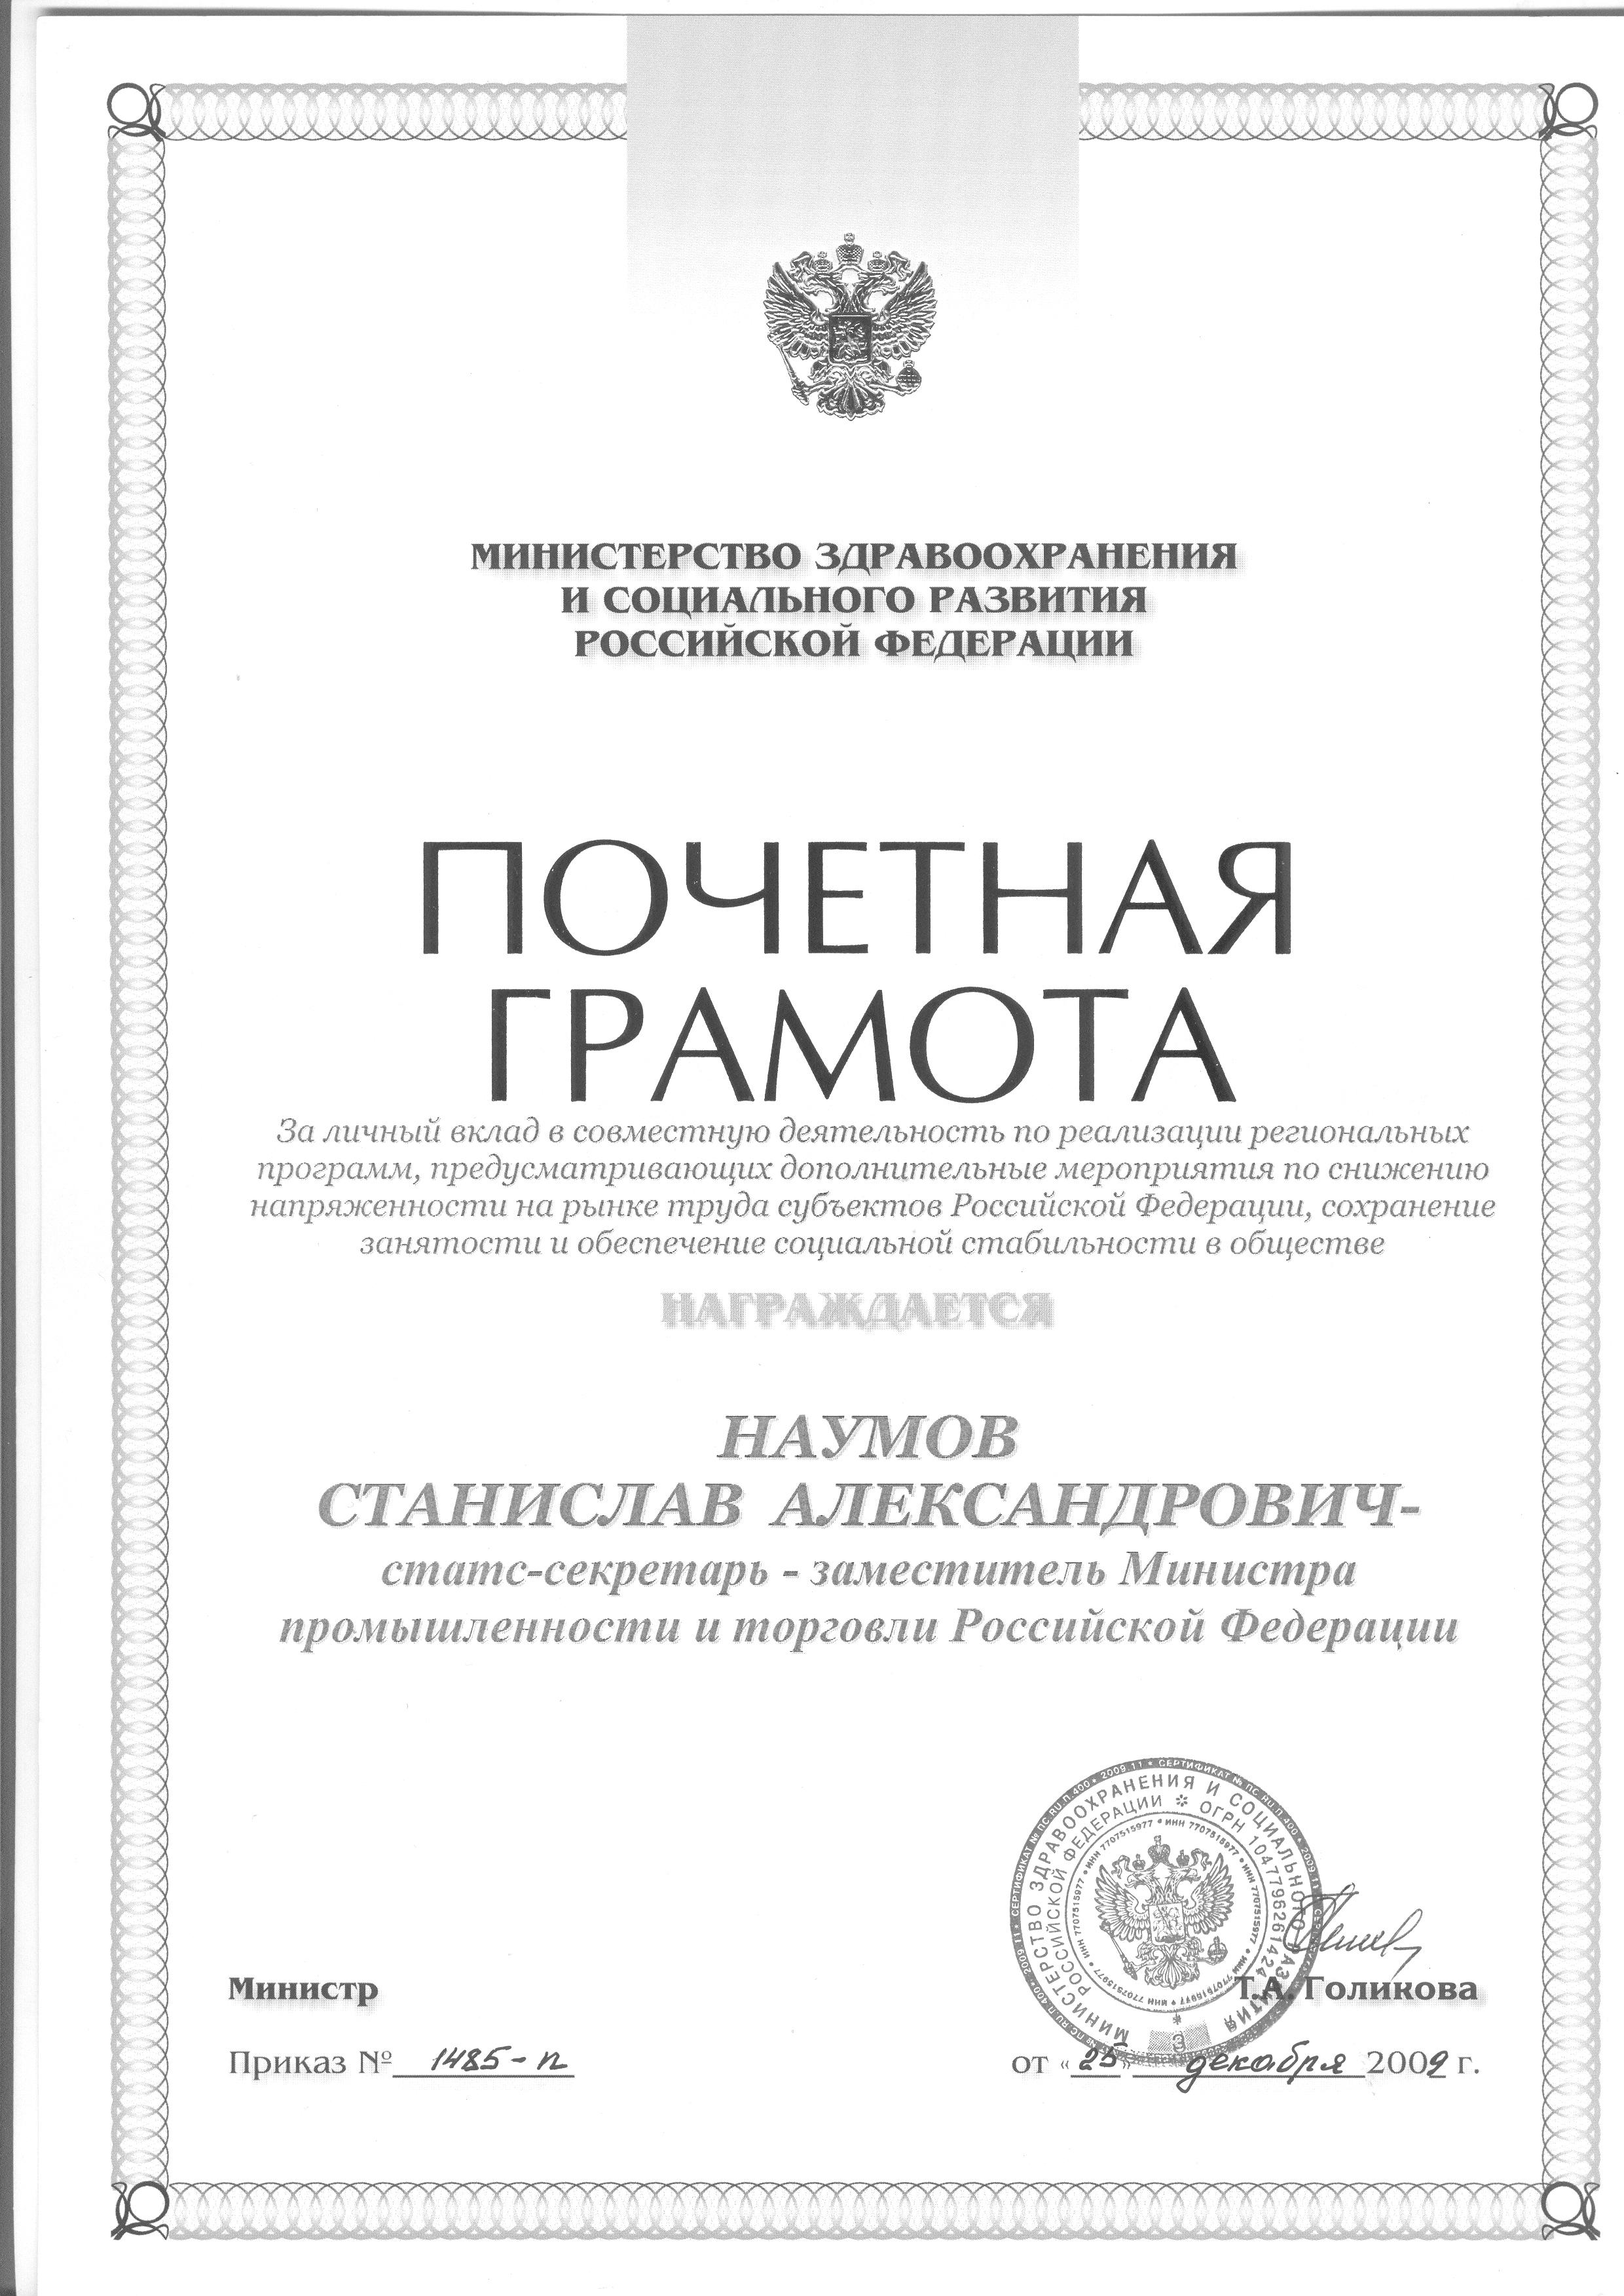 Грамота - Наумов